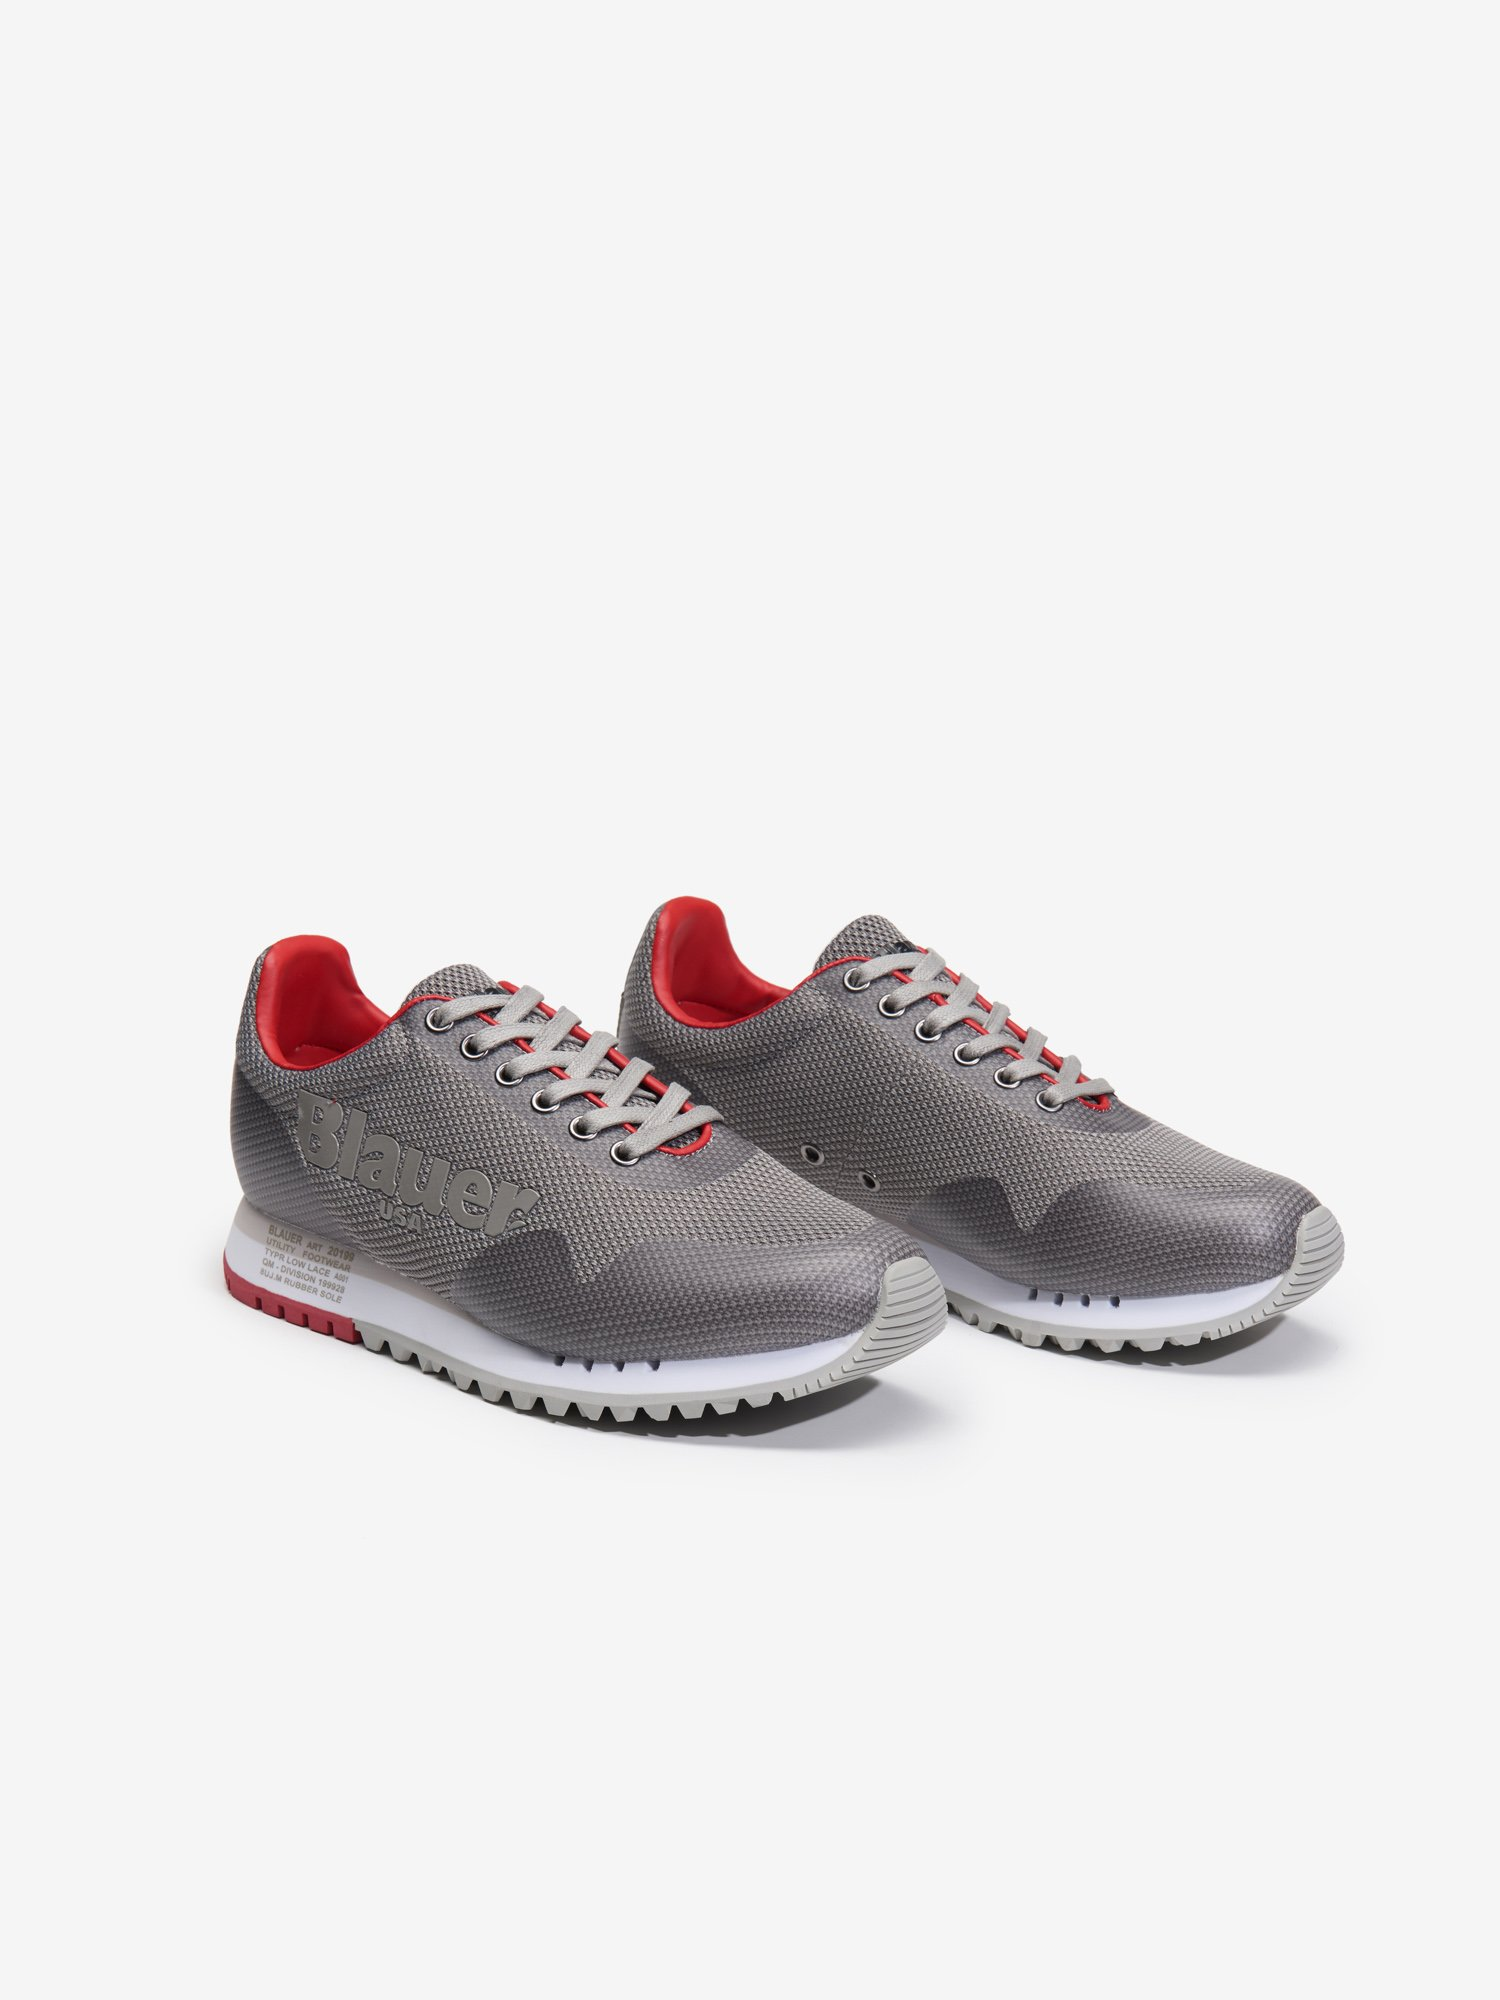 329a82845b62 Chaussures Homme Mode | Site Officiel de Blauer USA ®